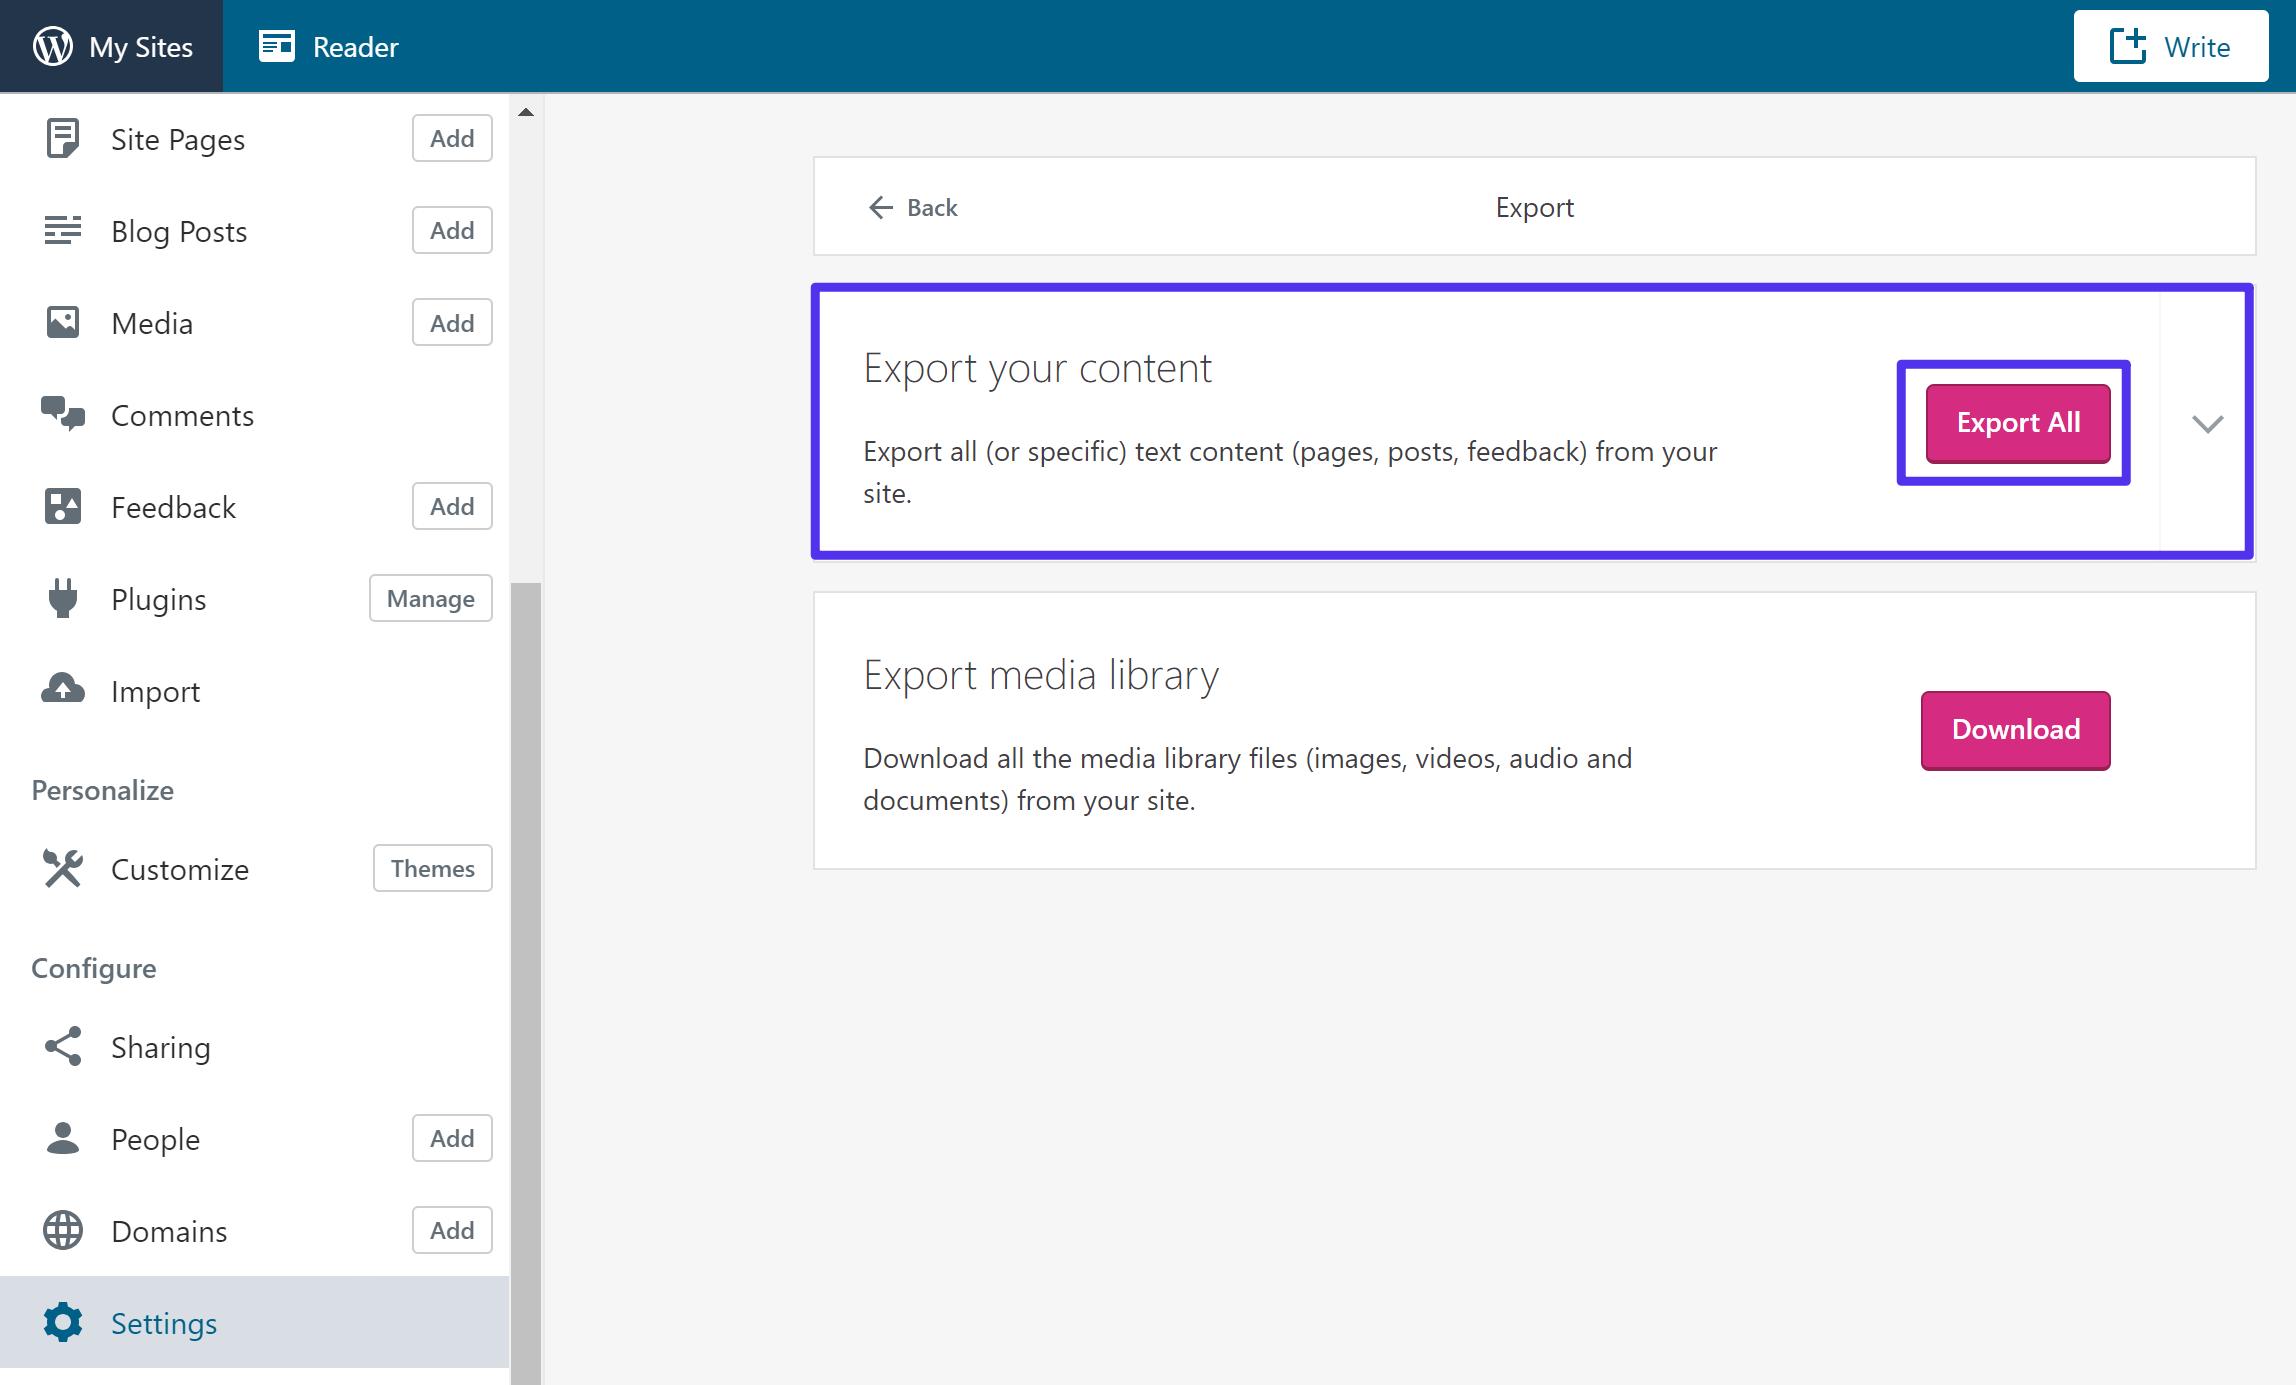 Export your content from WordPress.com